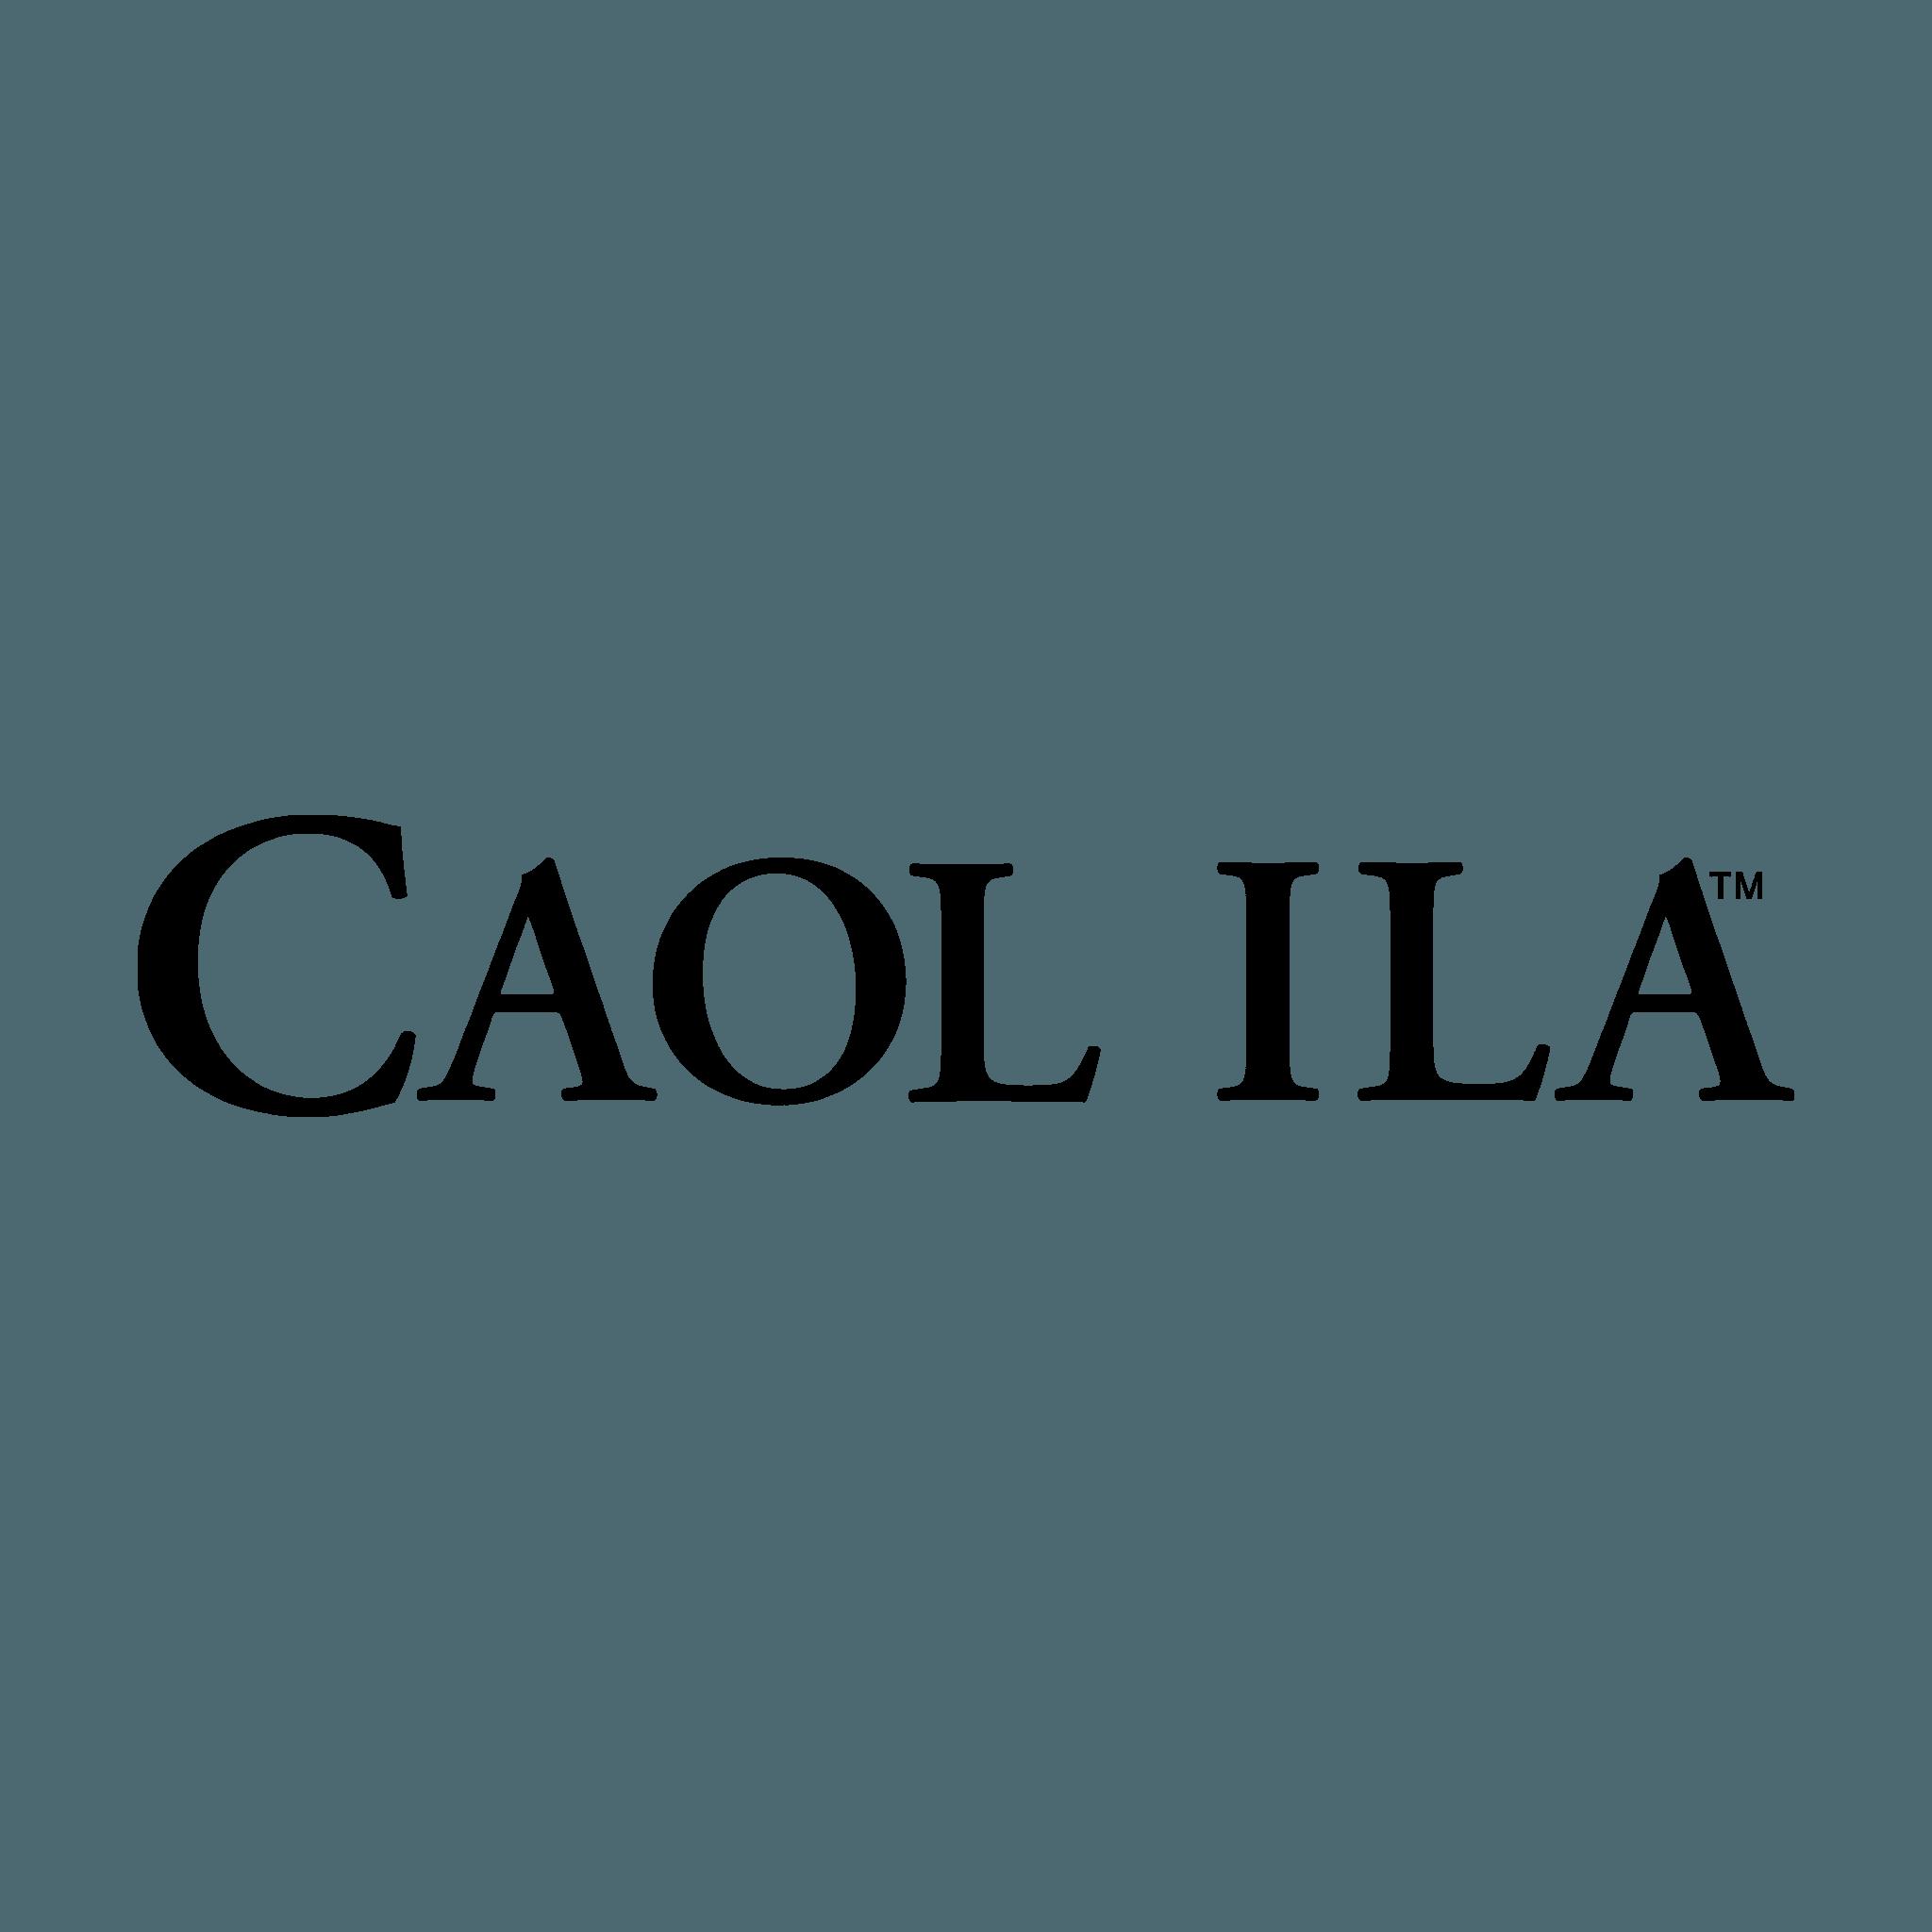 Caol Ila Logo